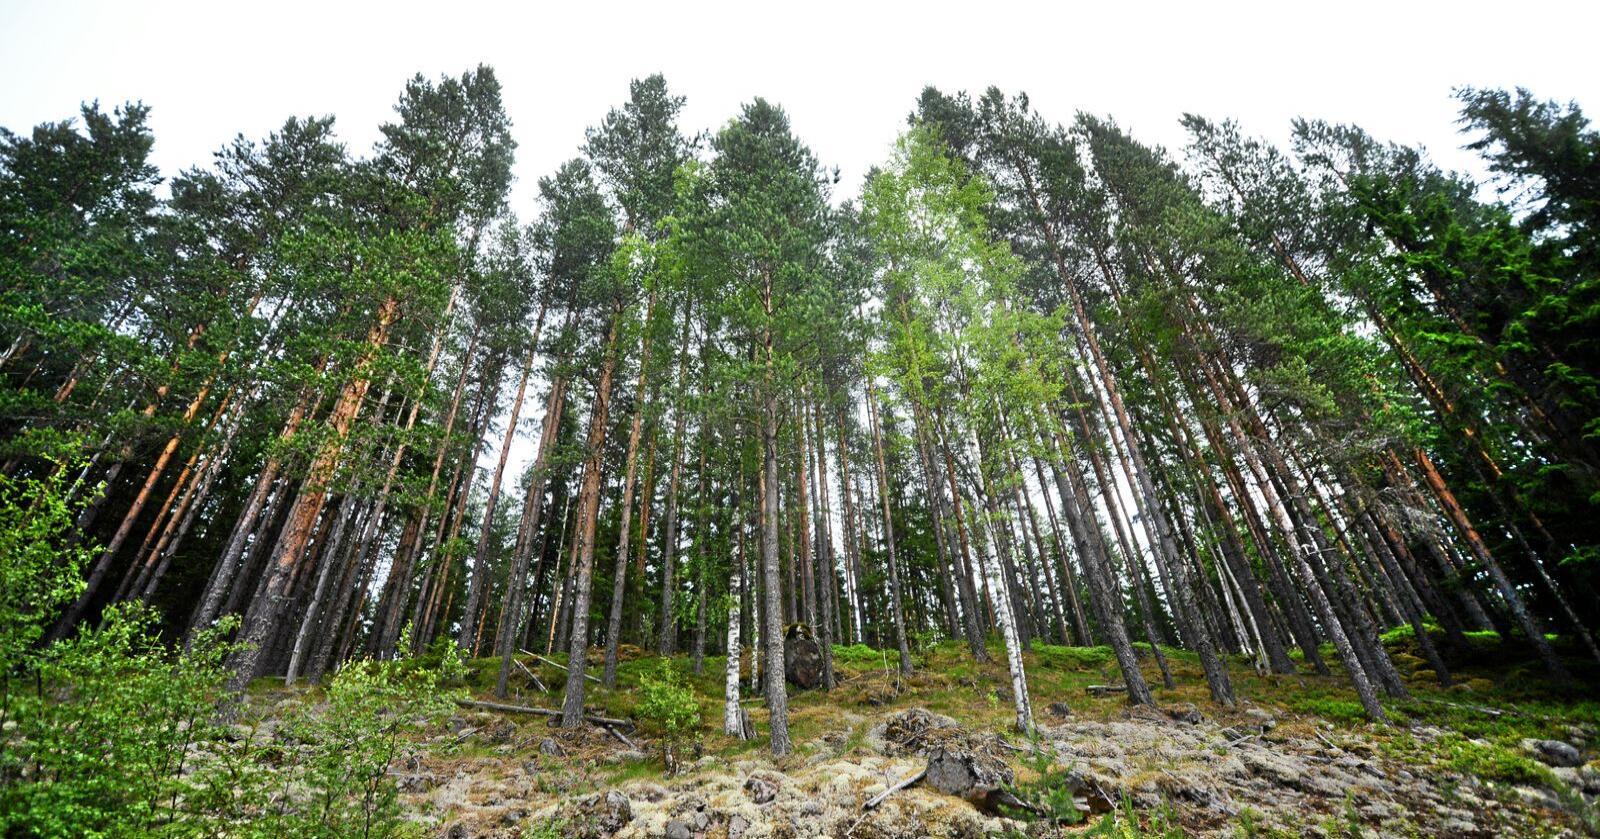 Delte meninger om skogsatsingen i årets statsbudsjett-forslag fra regjeringen. Foto: Siri Juell Rasmussen